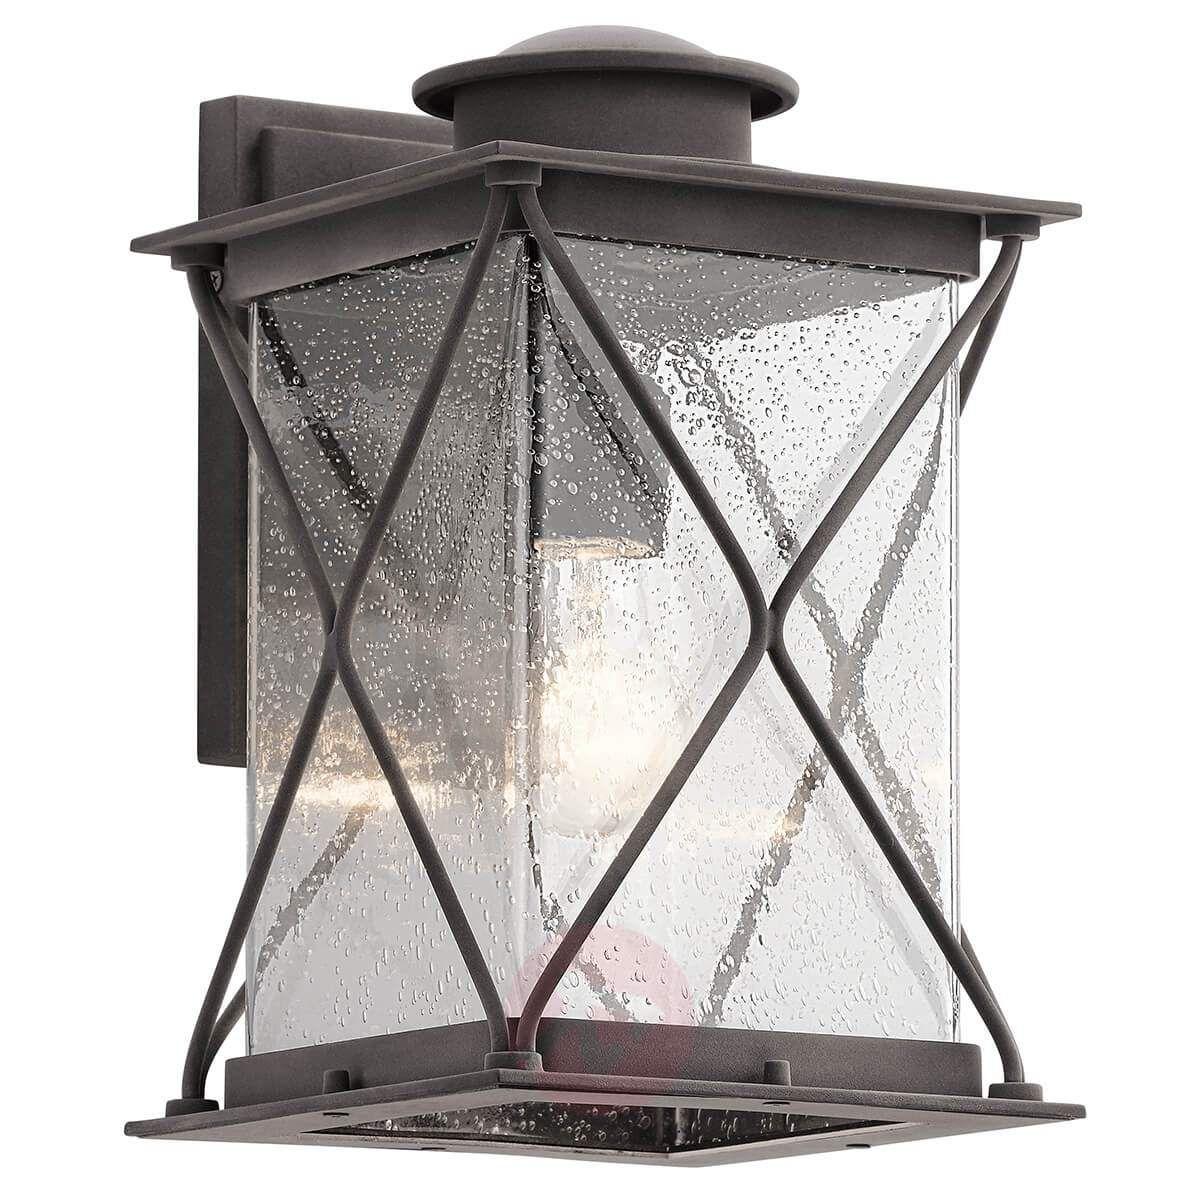 Duza Zewnetrzna Lampa Scienna Argyle Lampy Wiszace Zewnetrzne W 2019 Lampy Oswietlenie Zewnetrzne I Oswietlenie